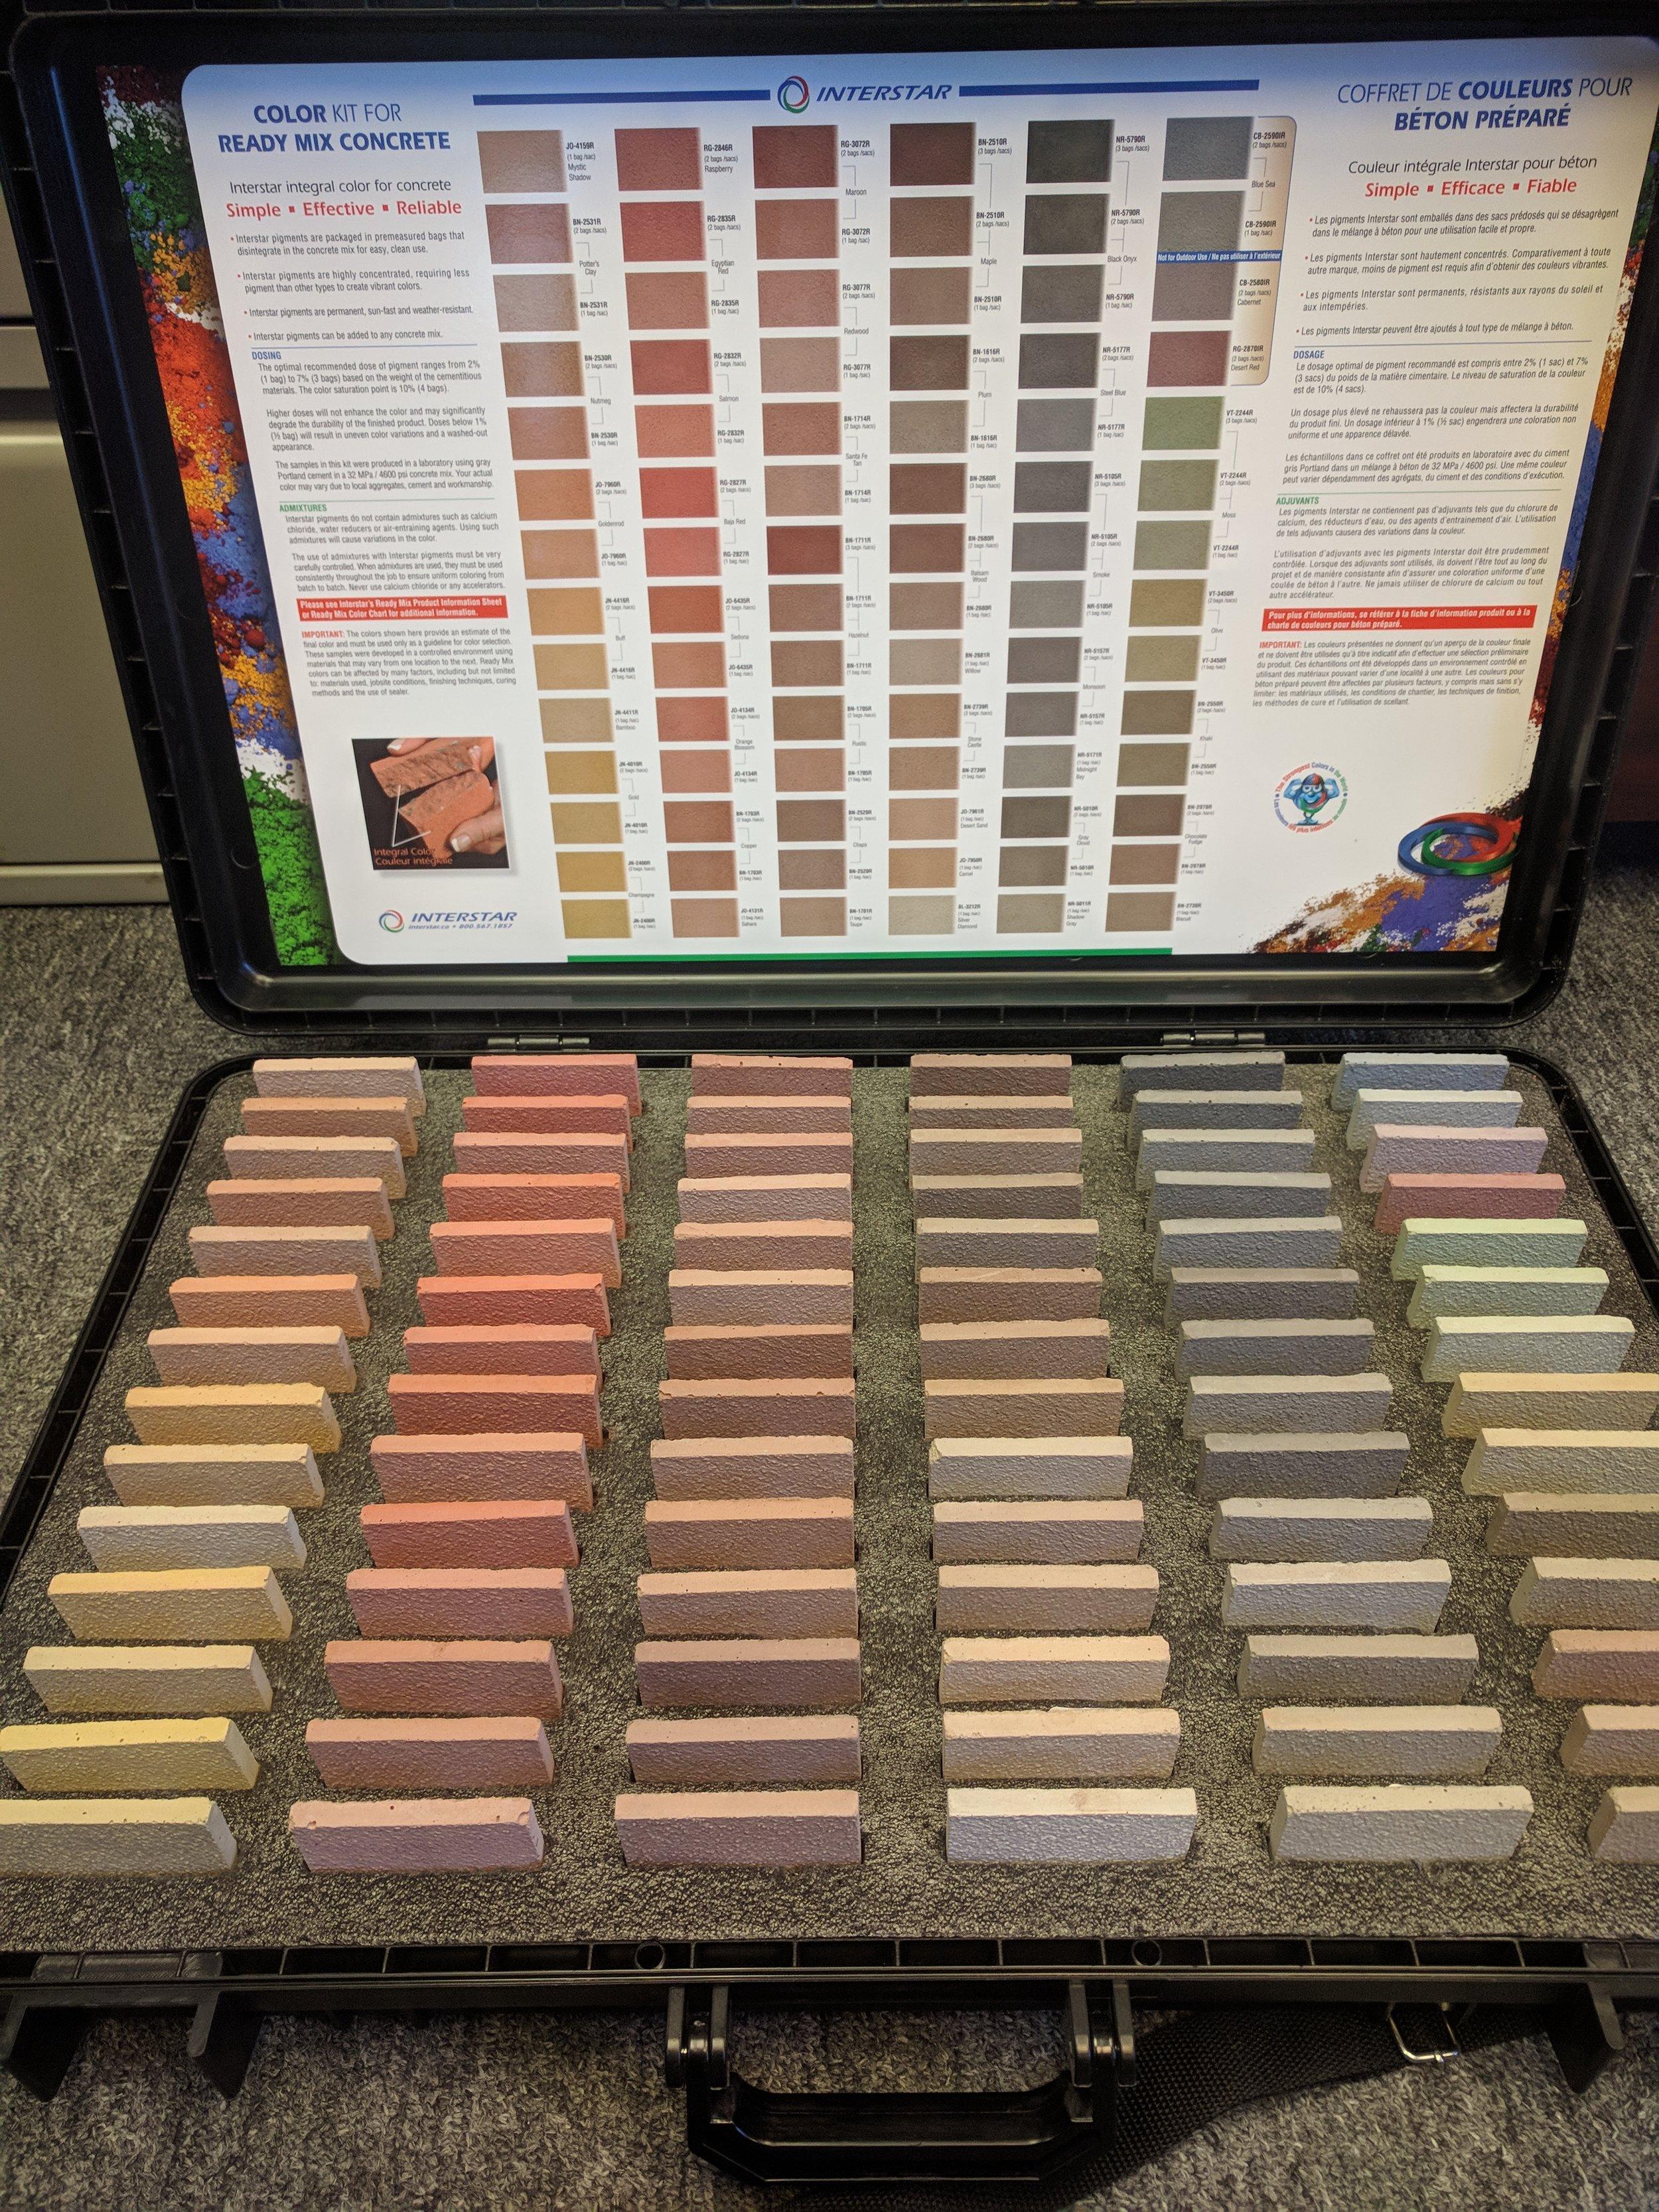 color kit.jpg